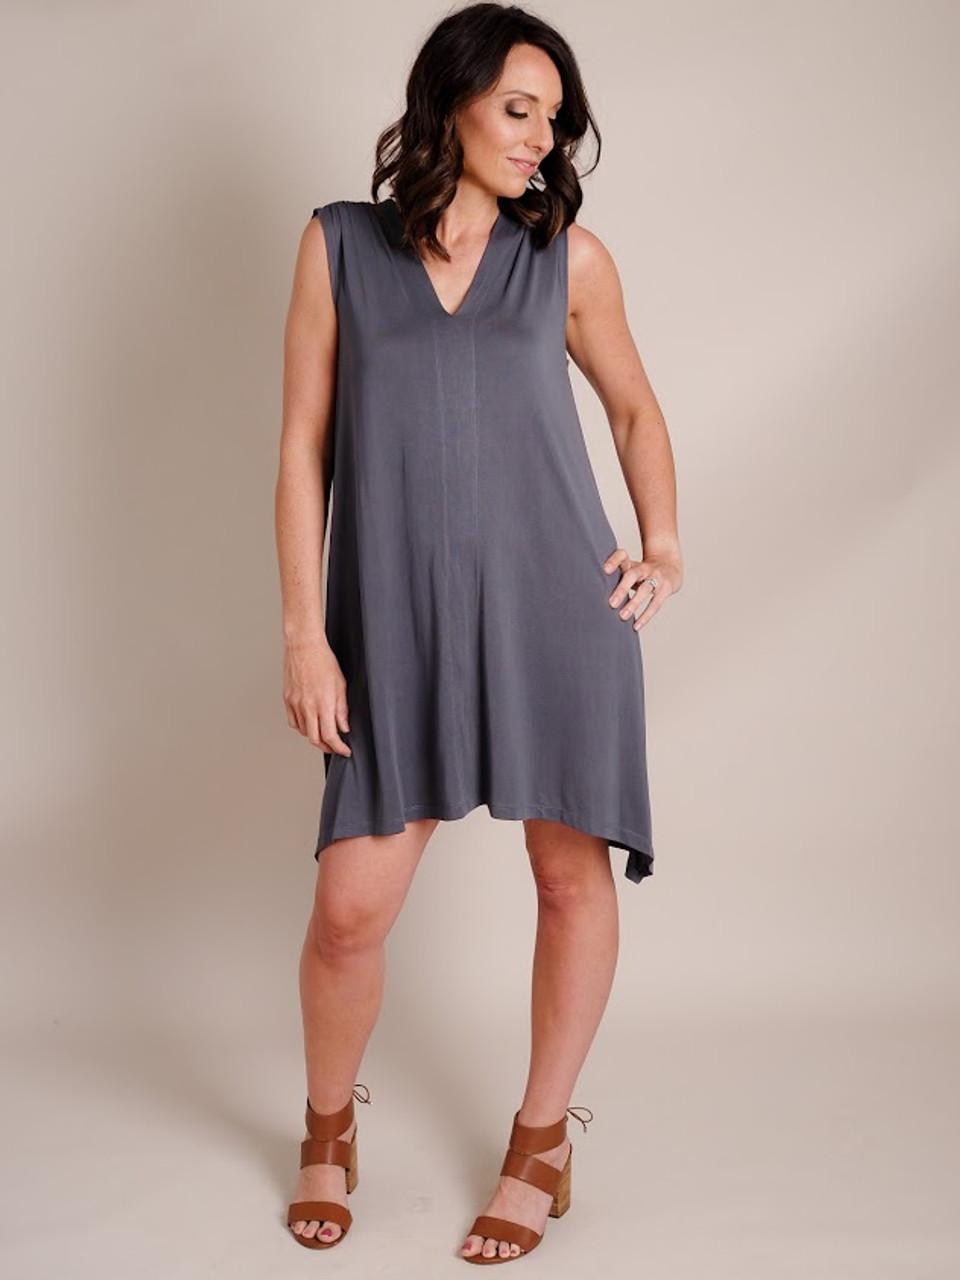 Woman Models Knee-Length, Sleeveless Gray Dress